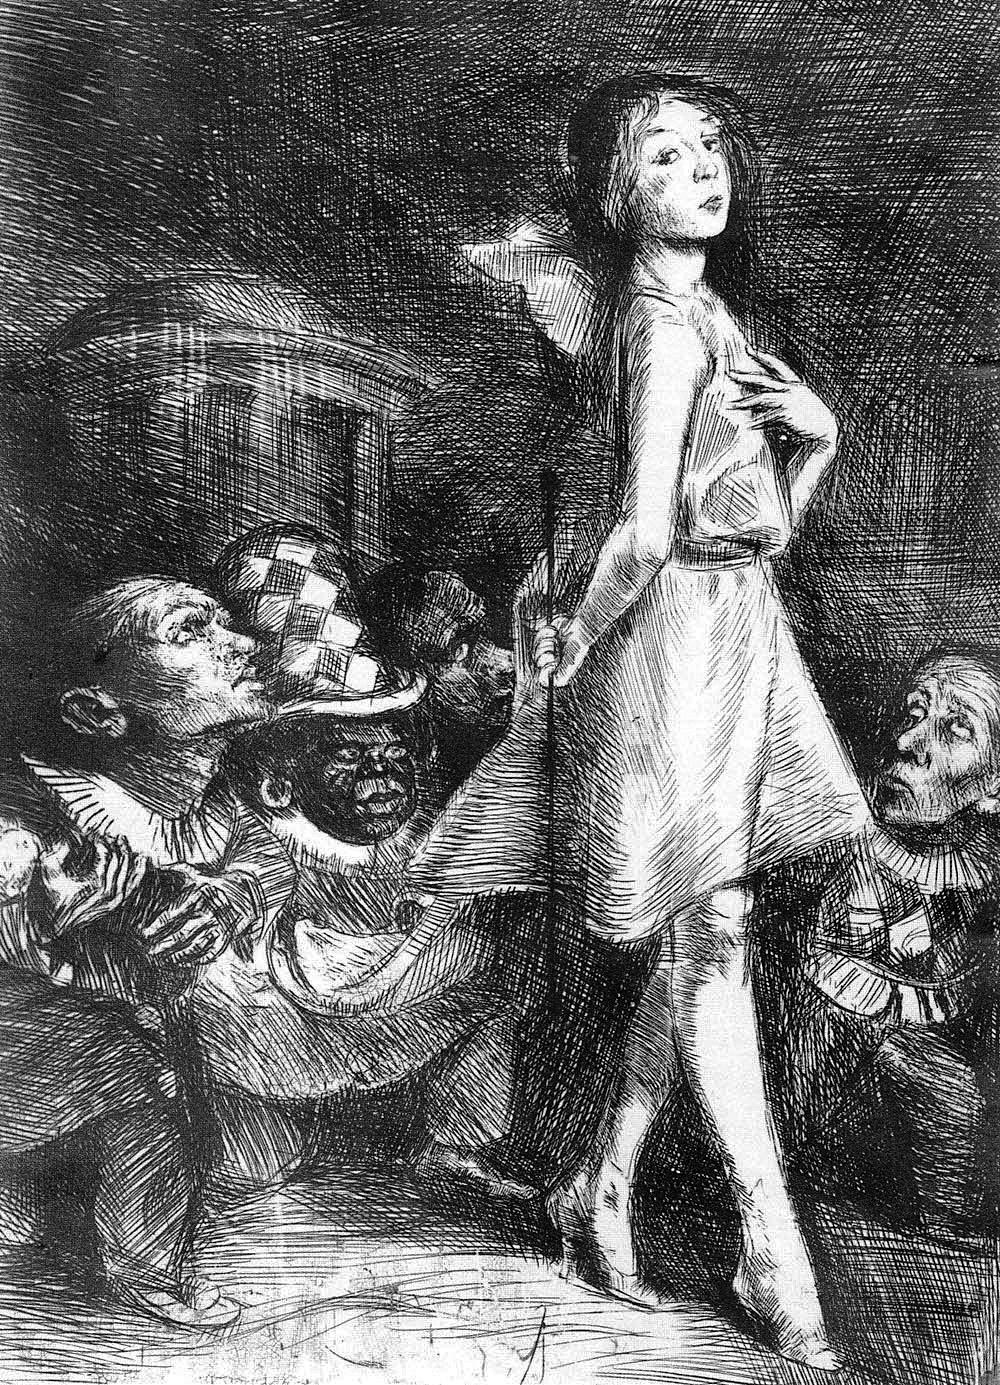 Бруно Шульц. Інфанта та карлики, 1920-22; сliché-verre